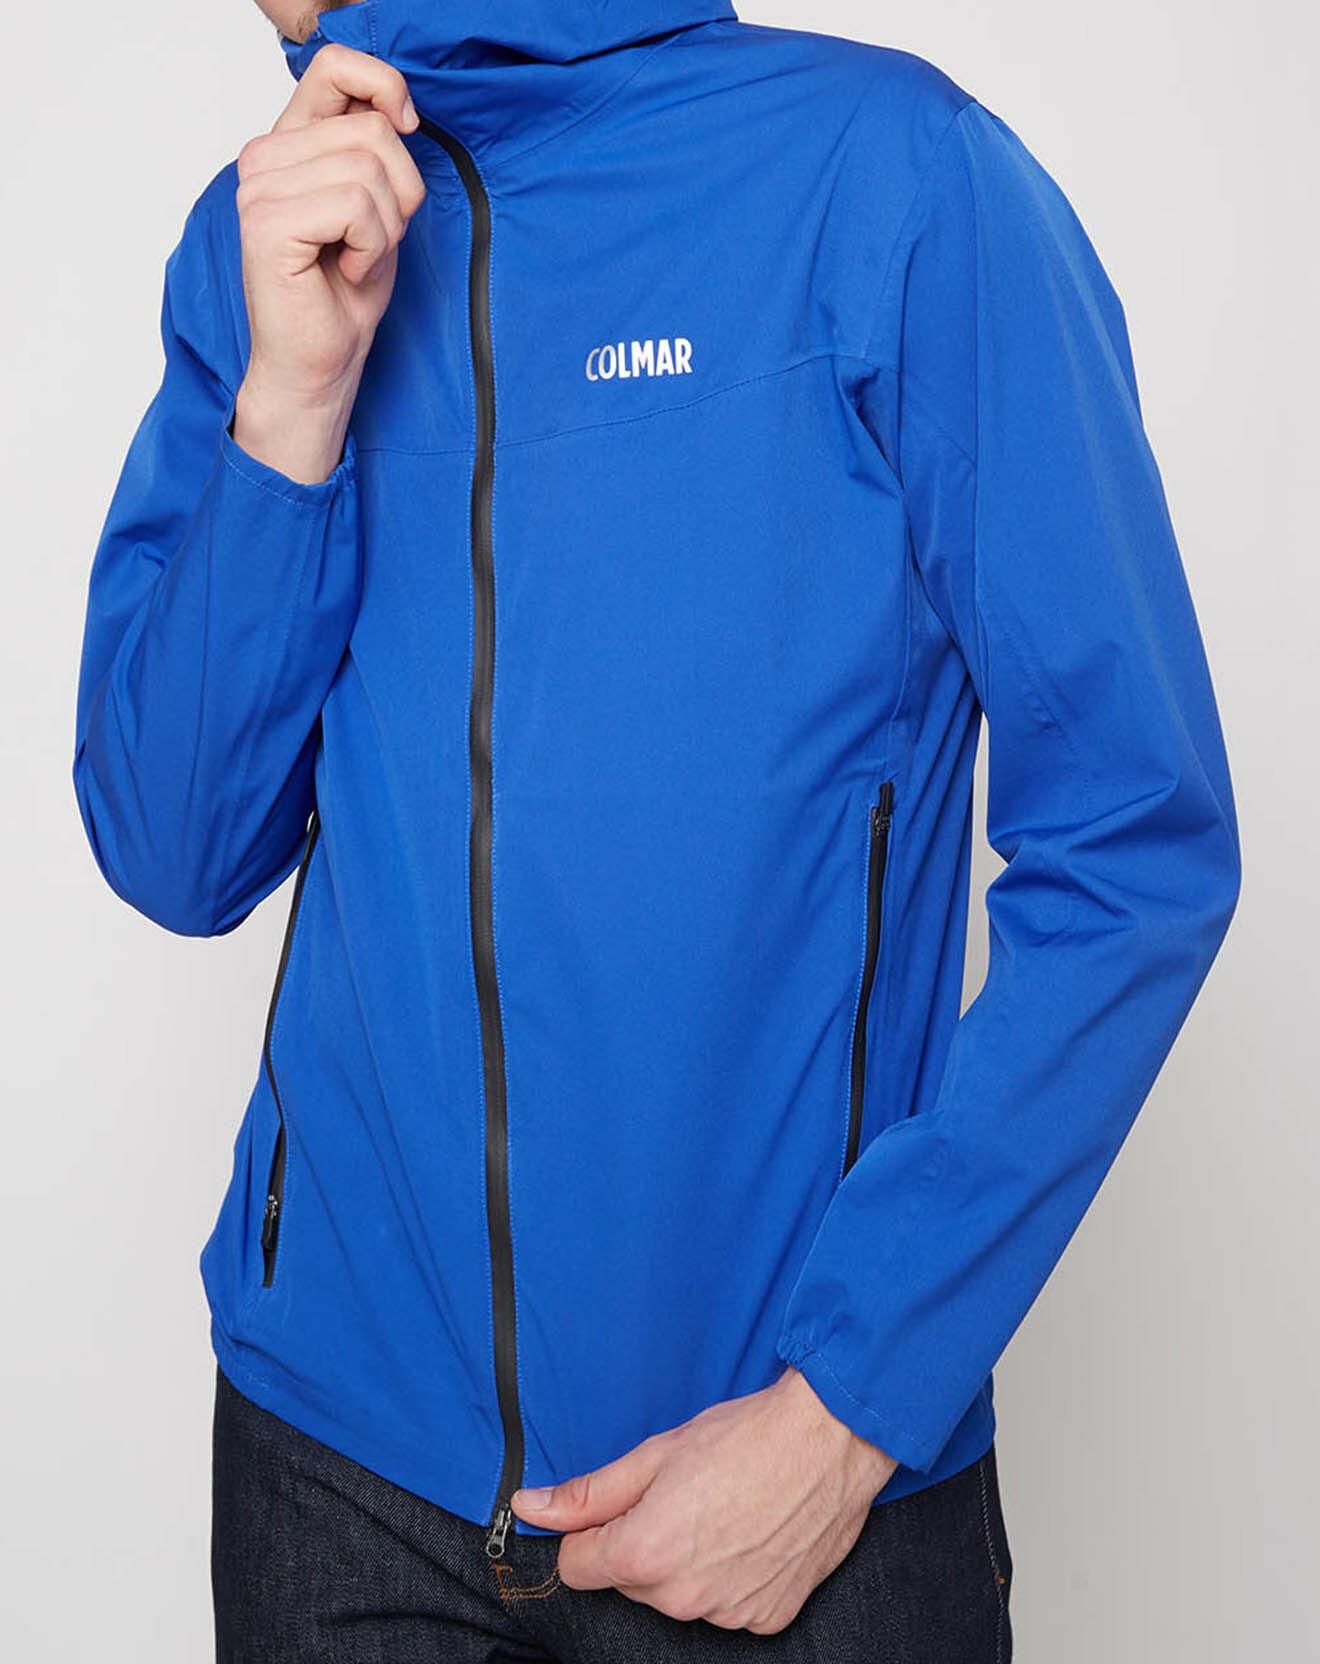 Veste à capuche Stretch WaterShield bleue - Colmar - Modalova